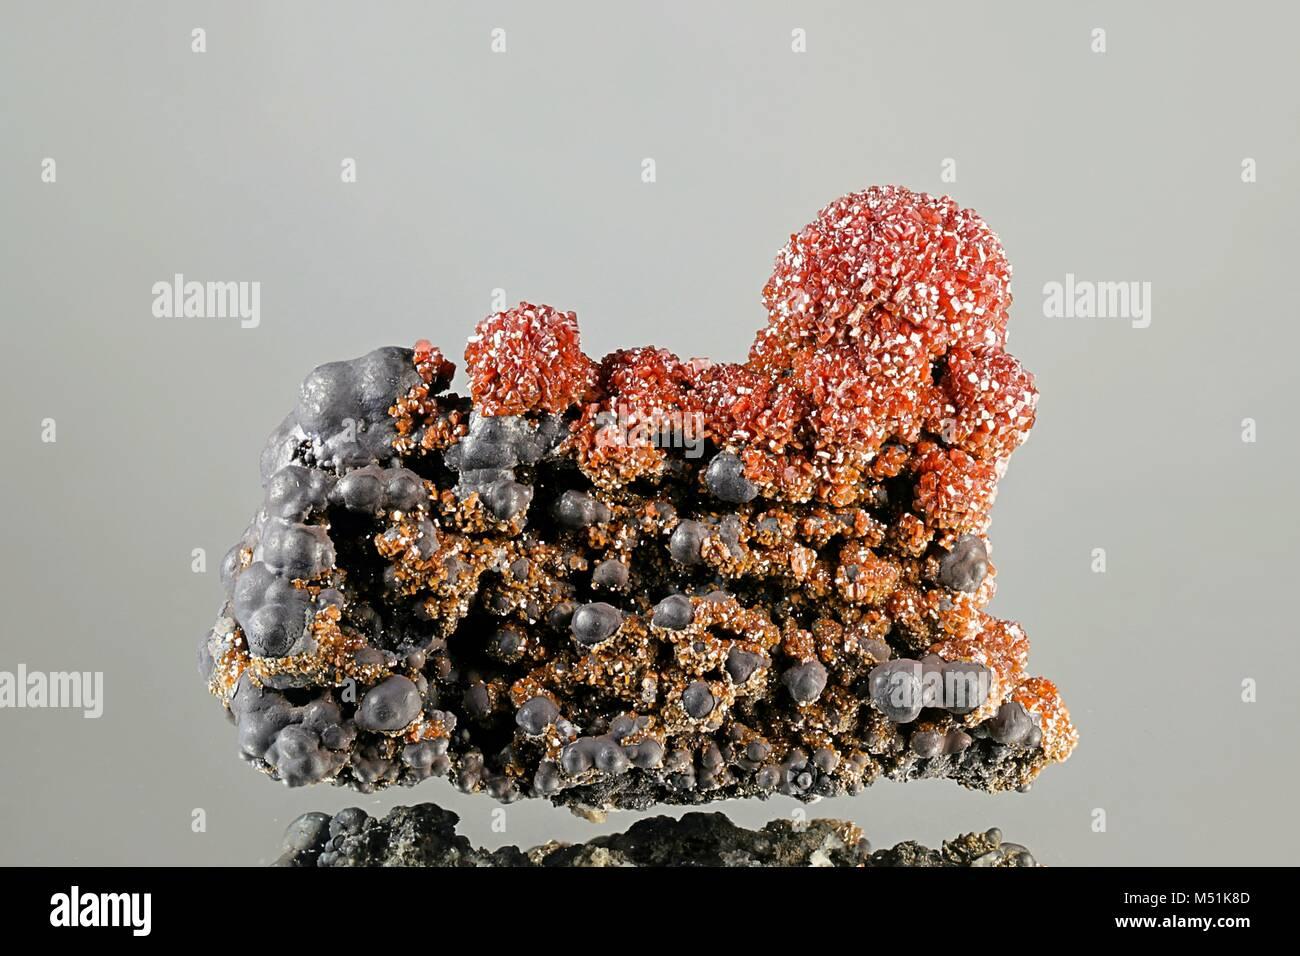 Vanadinite crystals on a botryoidal goethite matrix from Taouz, Morocco - Stock Image